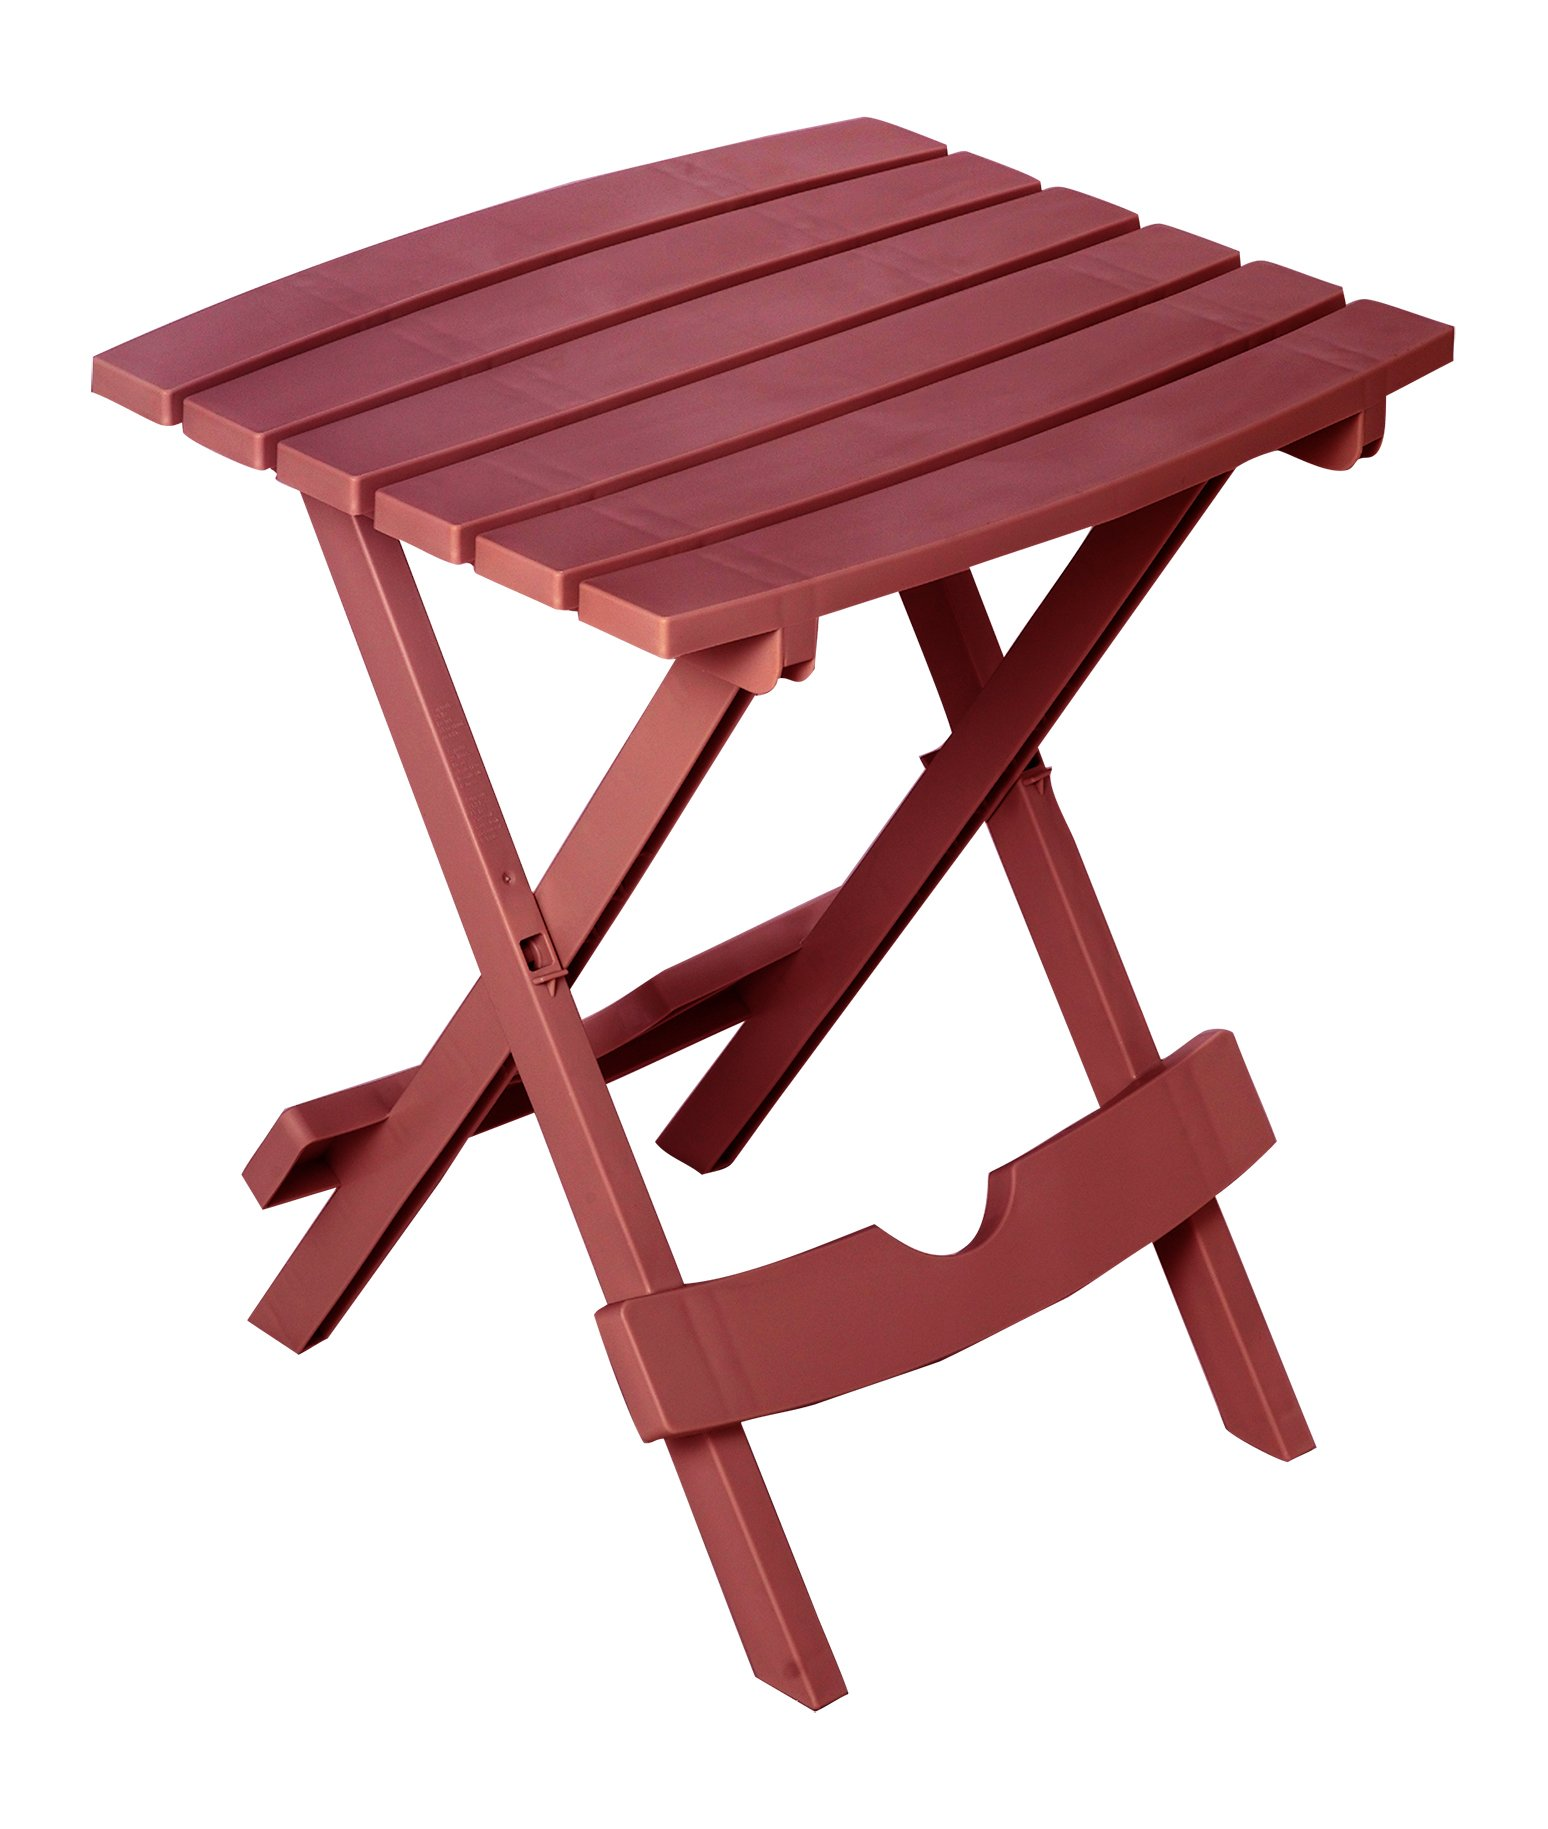 Adams Manufacturing 8500-95-3700 Plastic Quik-Fold Side Table, Merlot